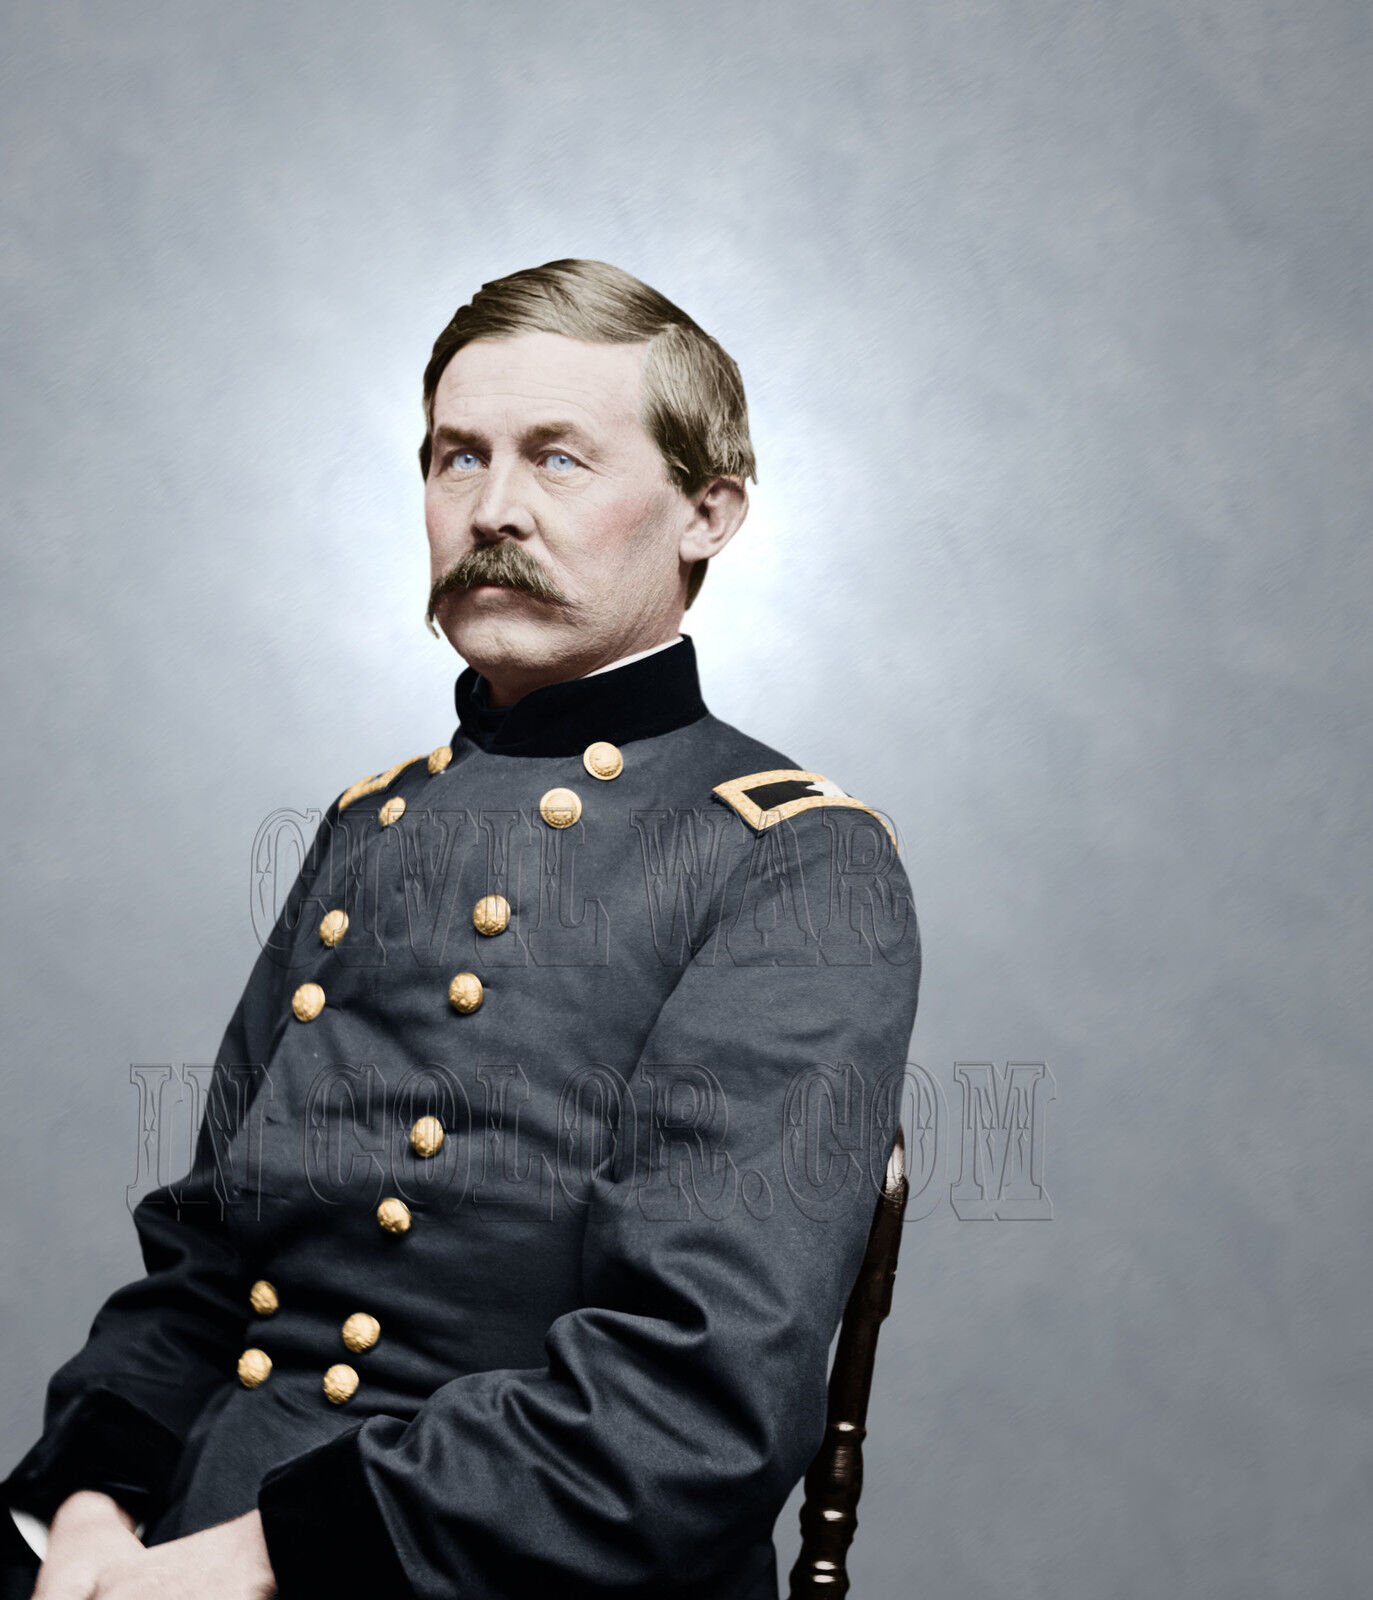 General John Buford Farbe Tinted Photo Civil War 06373